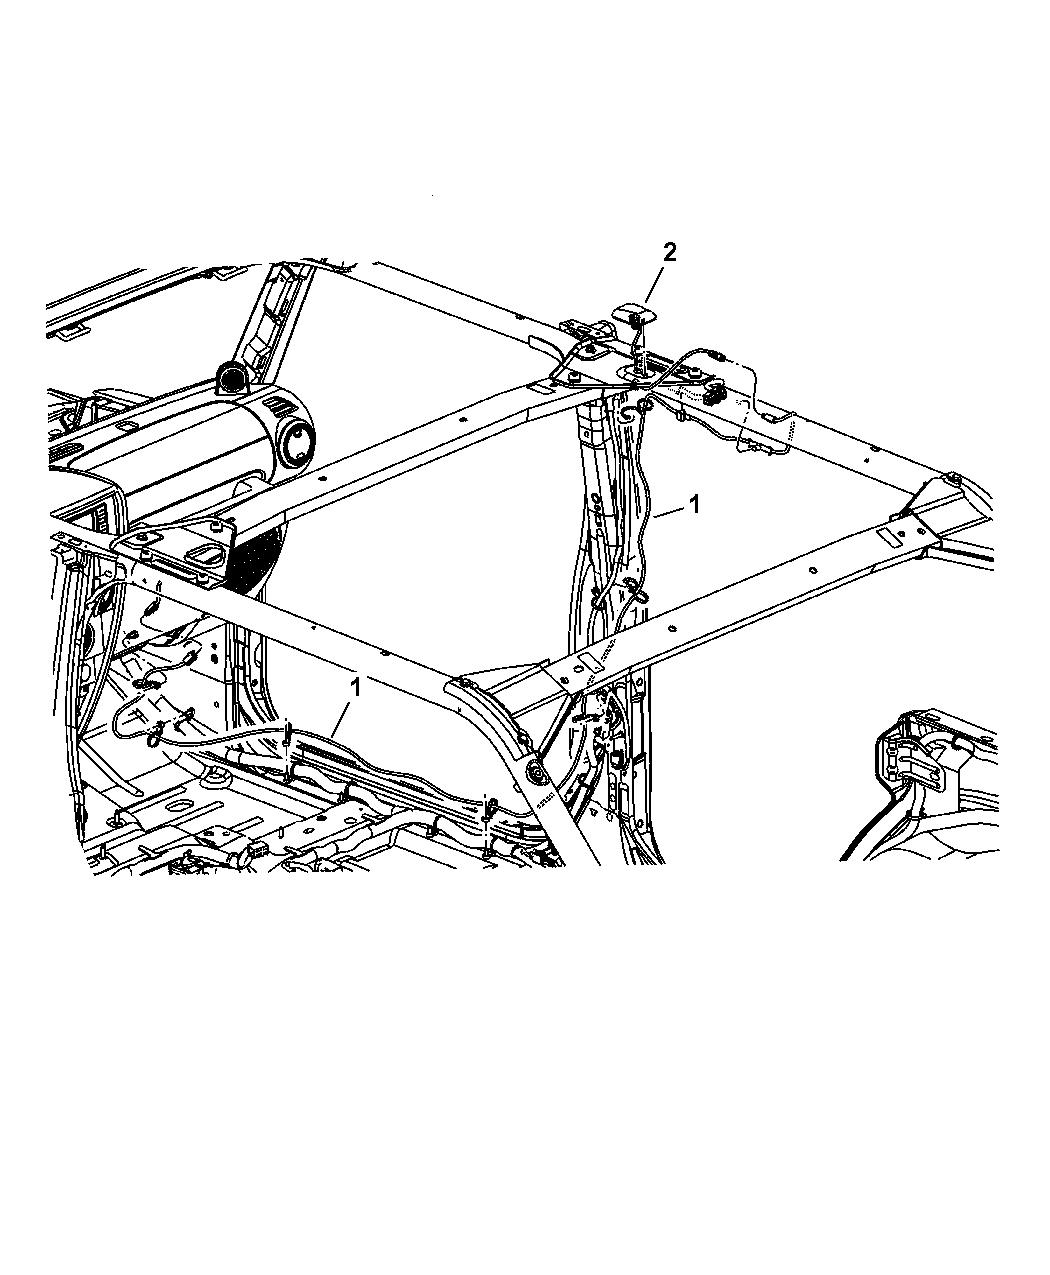 Jeep Wrangler Satellite Radio System